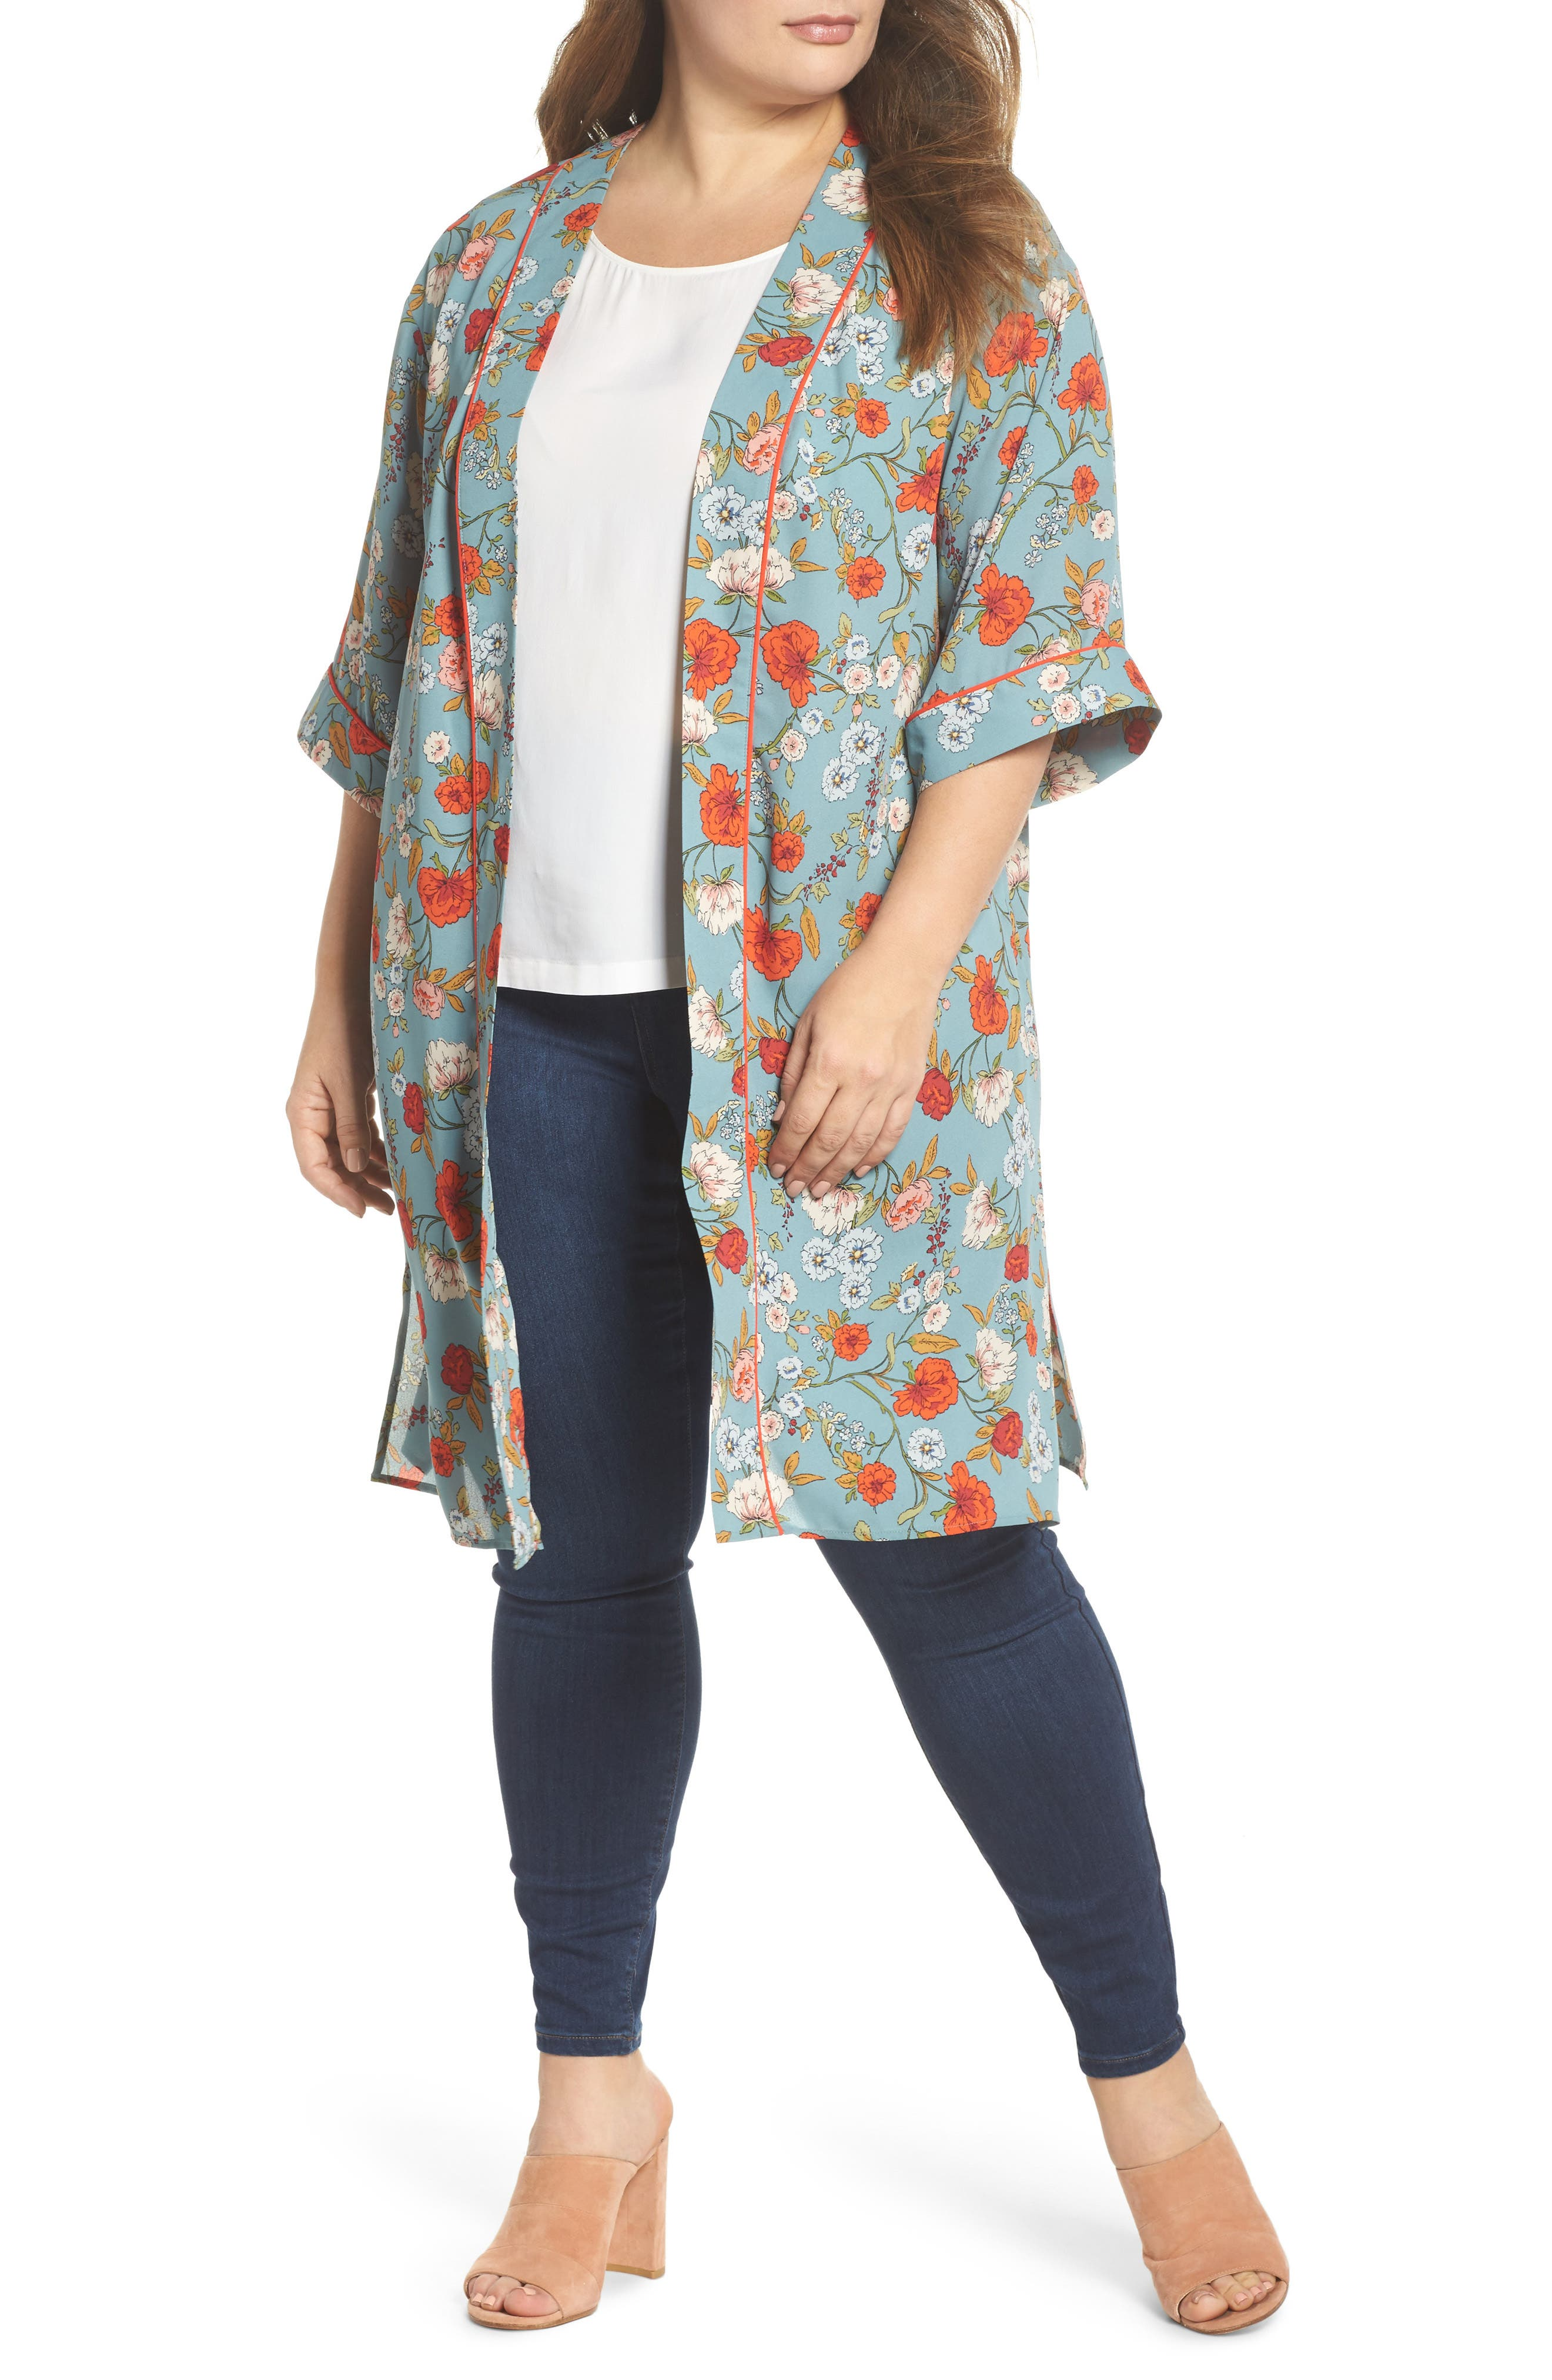 Floral Kimono,                             Main thumbnail 1, color,                             D598n Basil